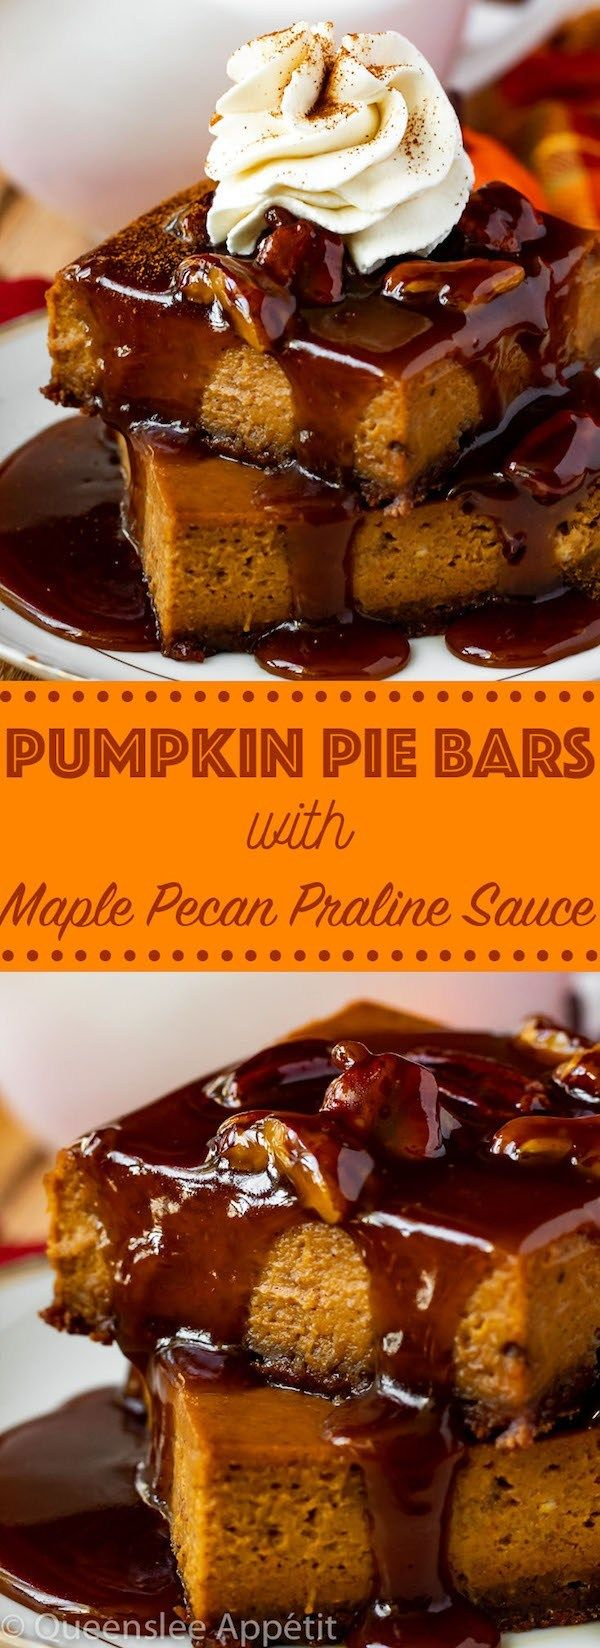 Pumpkin Pie Bars with Maple Pecan Praline Sauce   Recipe ...